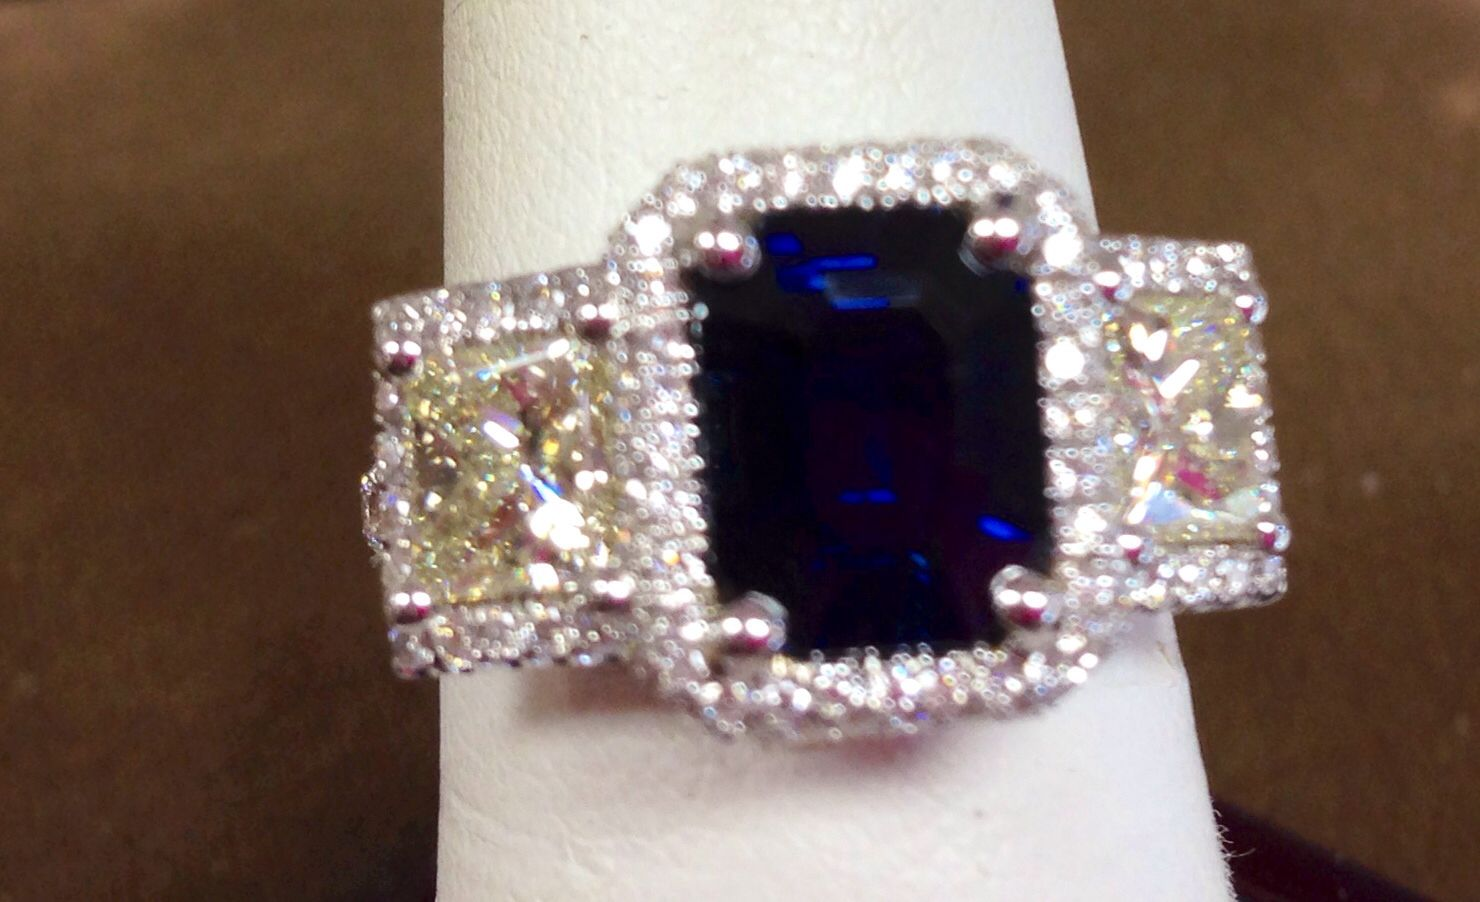 Blue sapphire with yellow diamonds